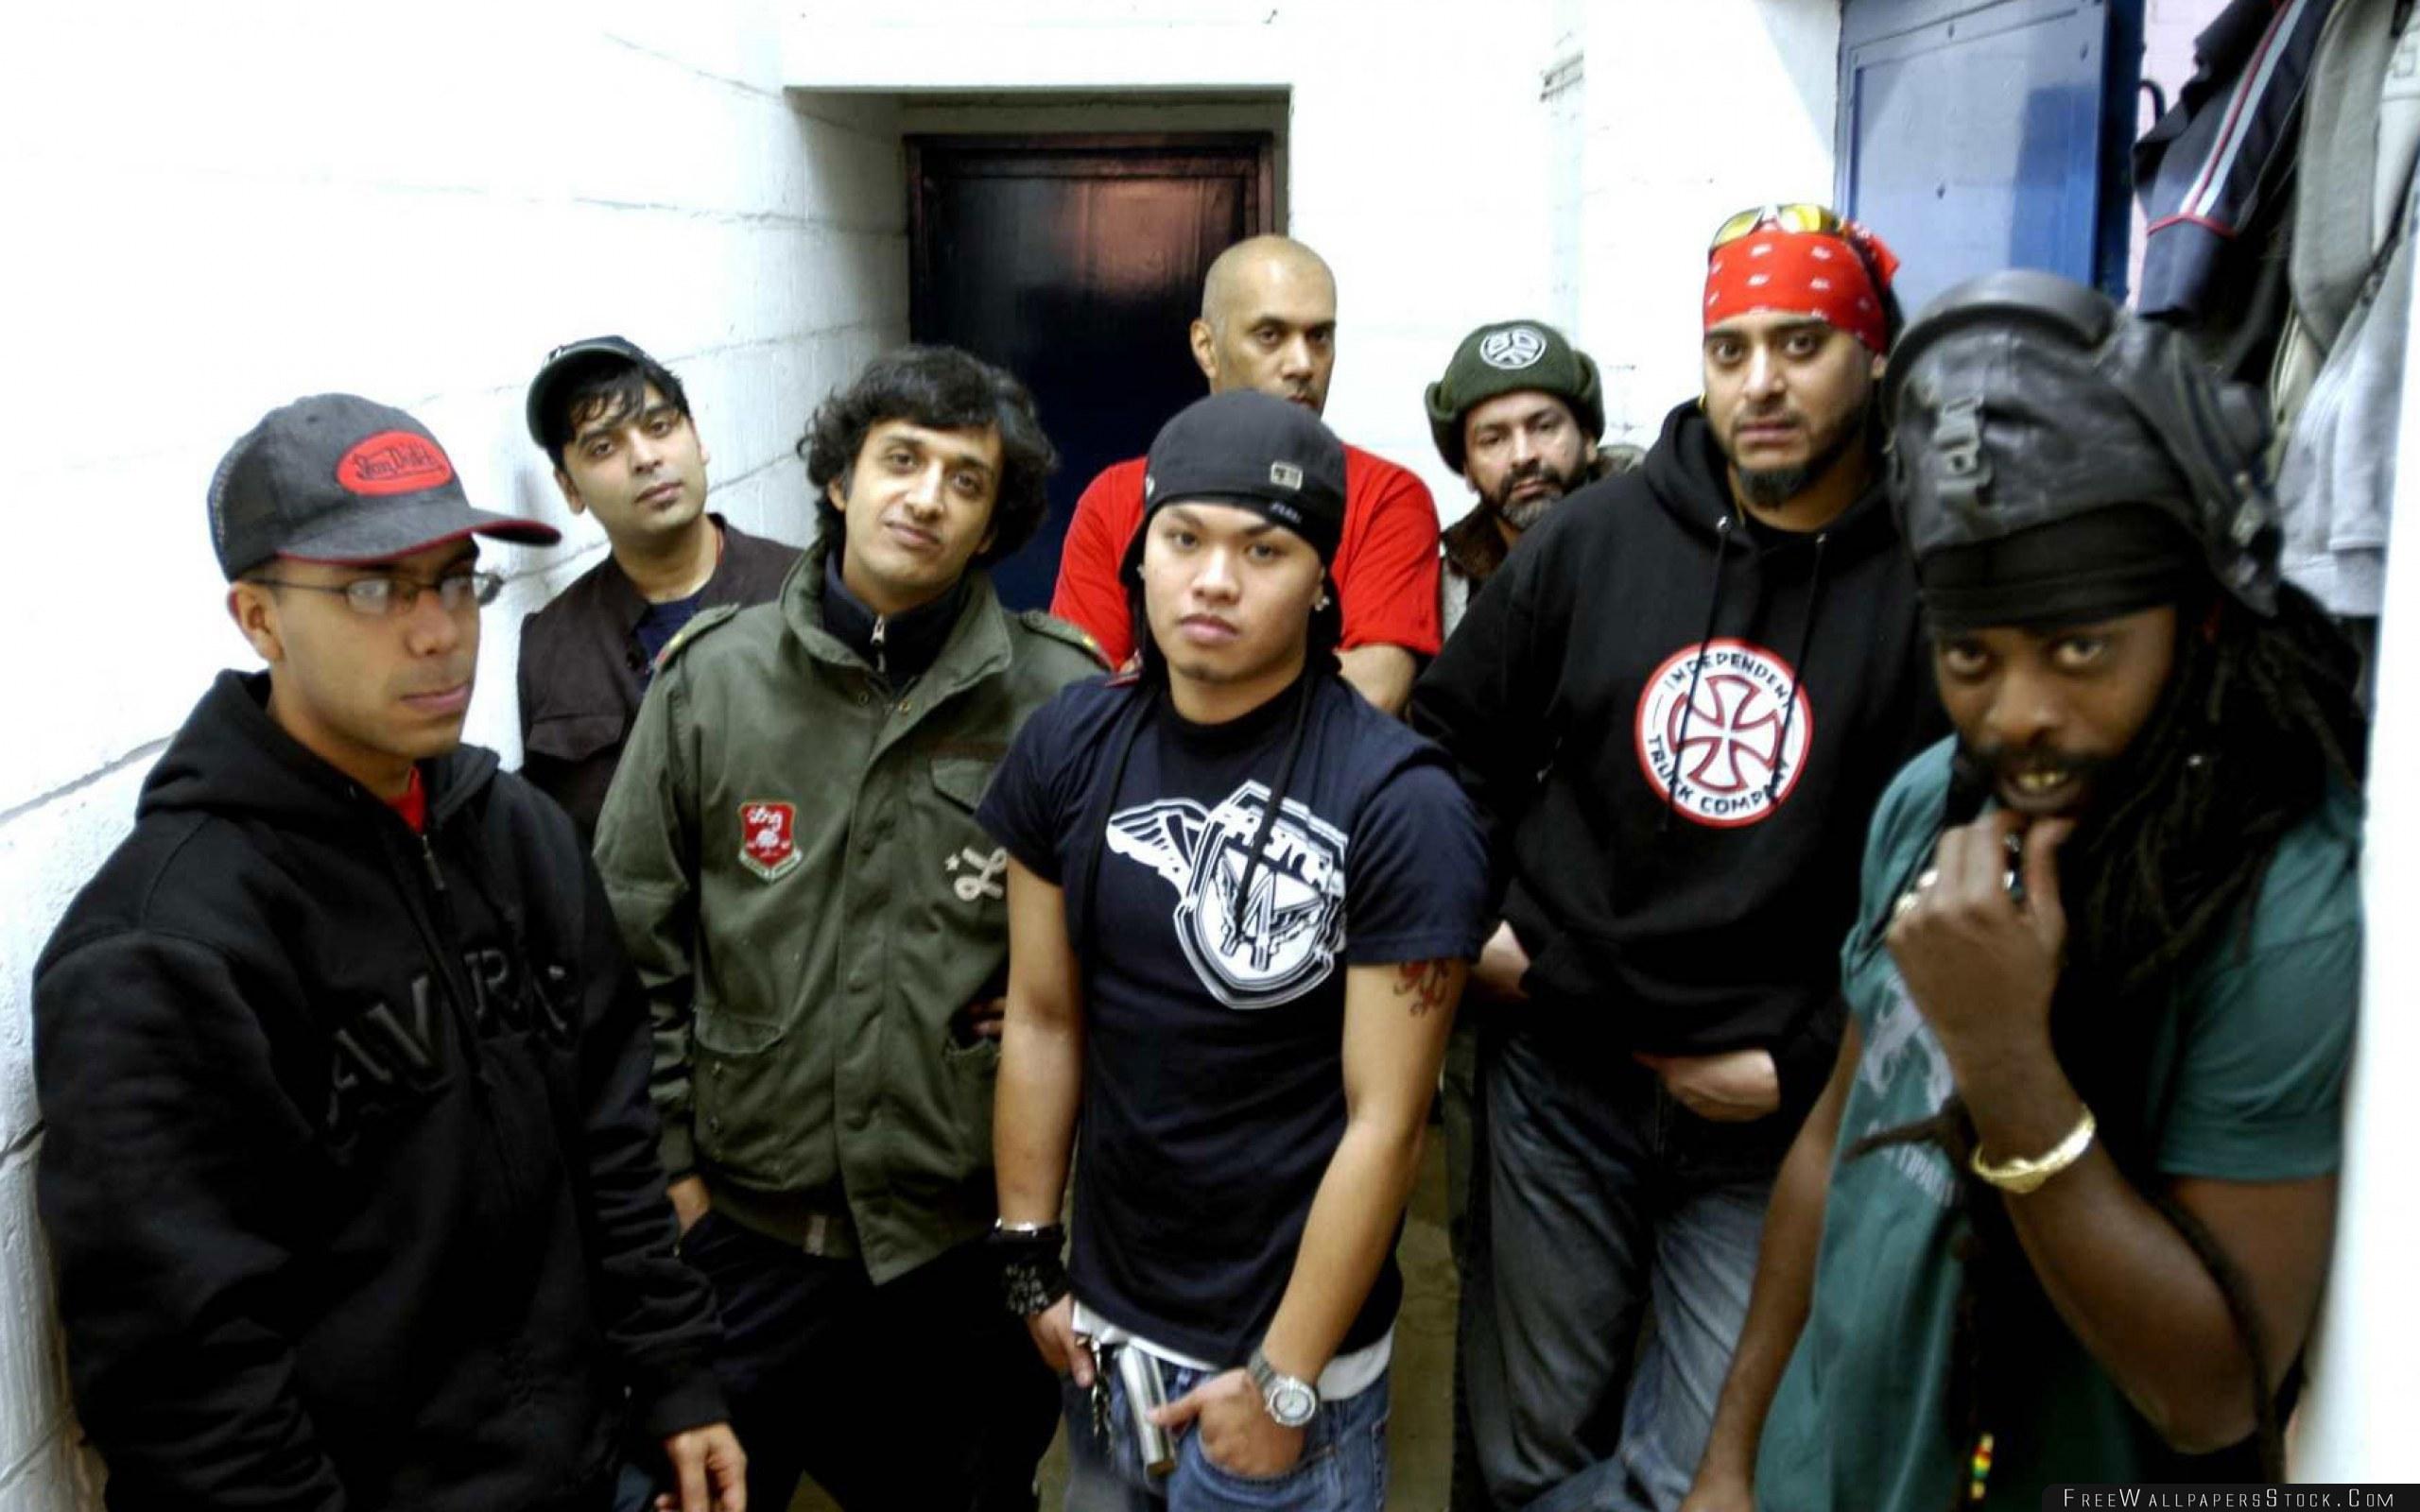 Download Free Wallpaper Asian Dub Foundation Band Members Look Room